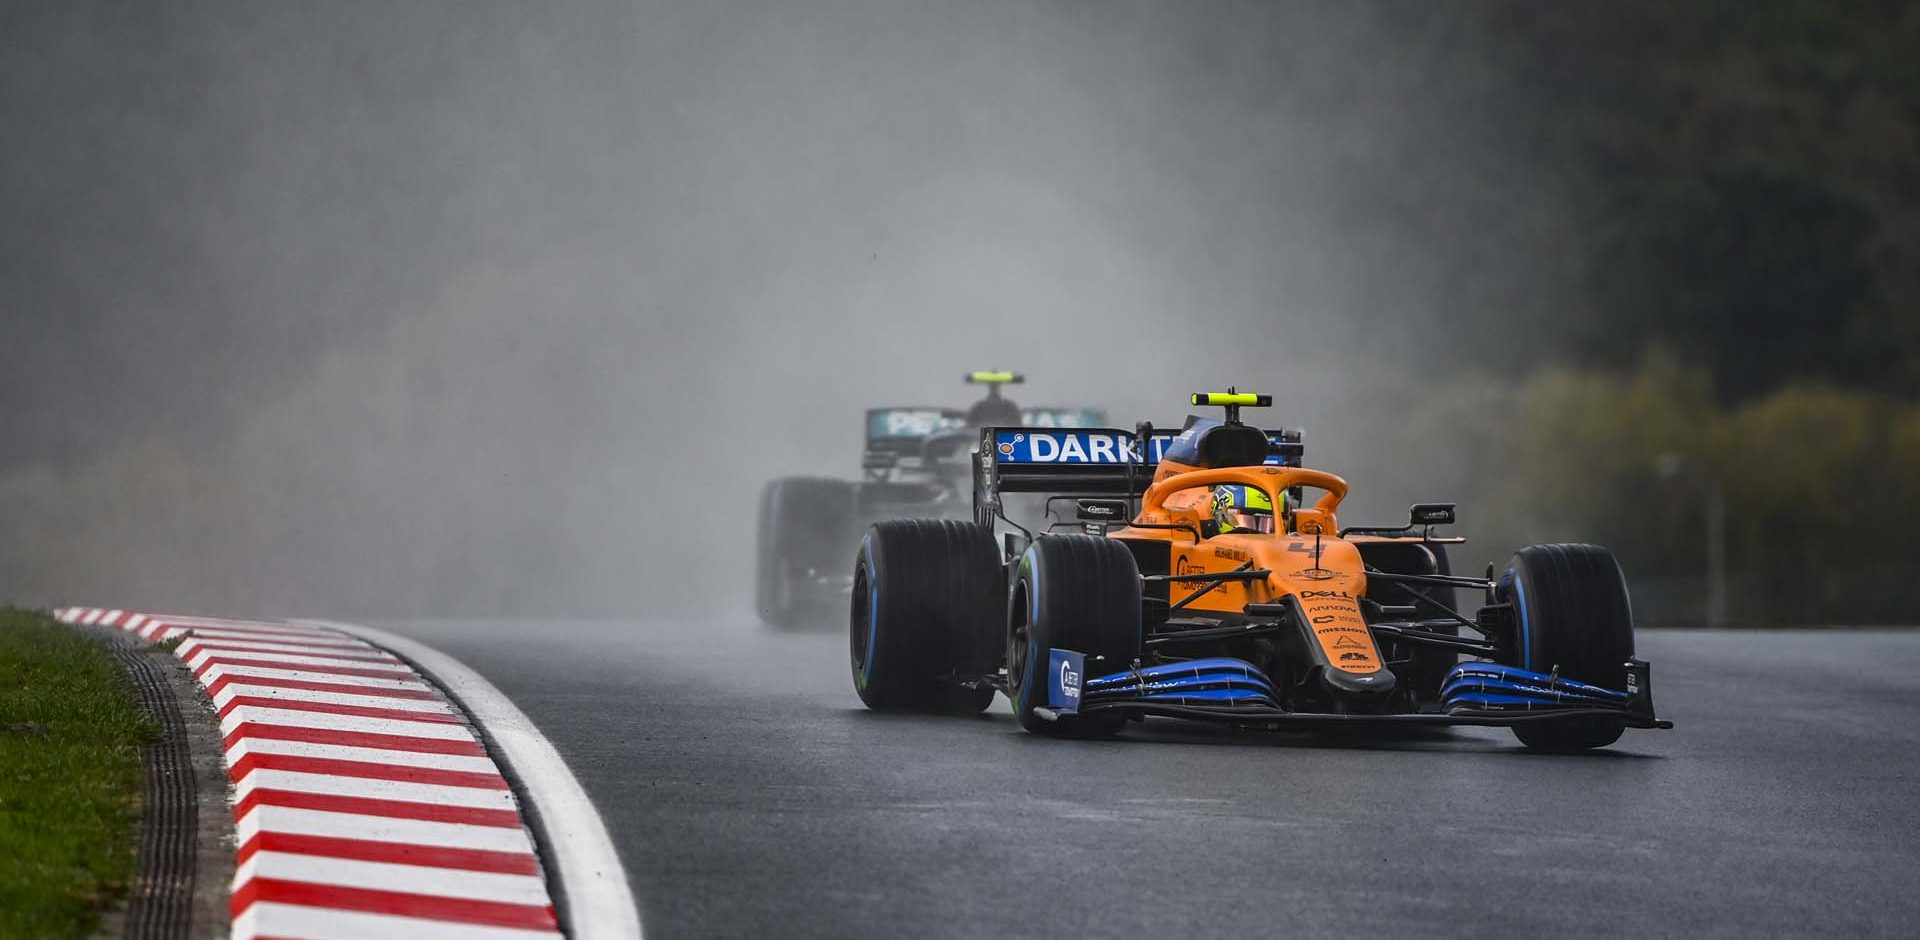 Lando Norris, McLaren MCL35, leads Valtteri Bottas, Mercedes F1 W11 EQ Performance